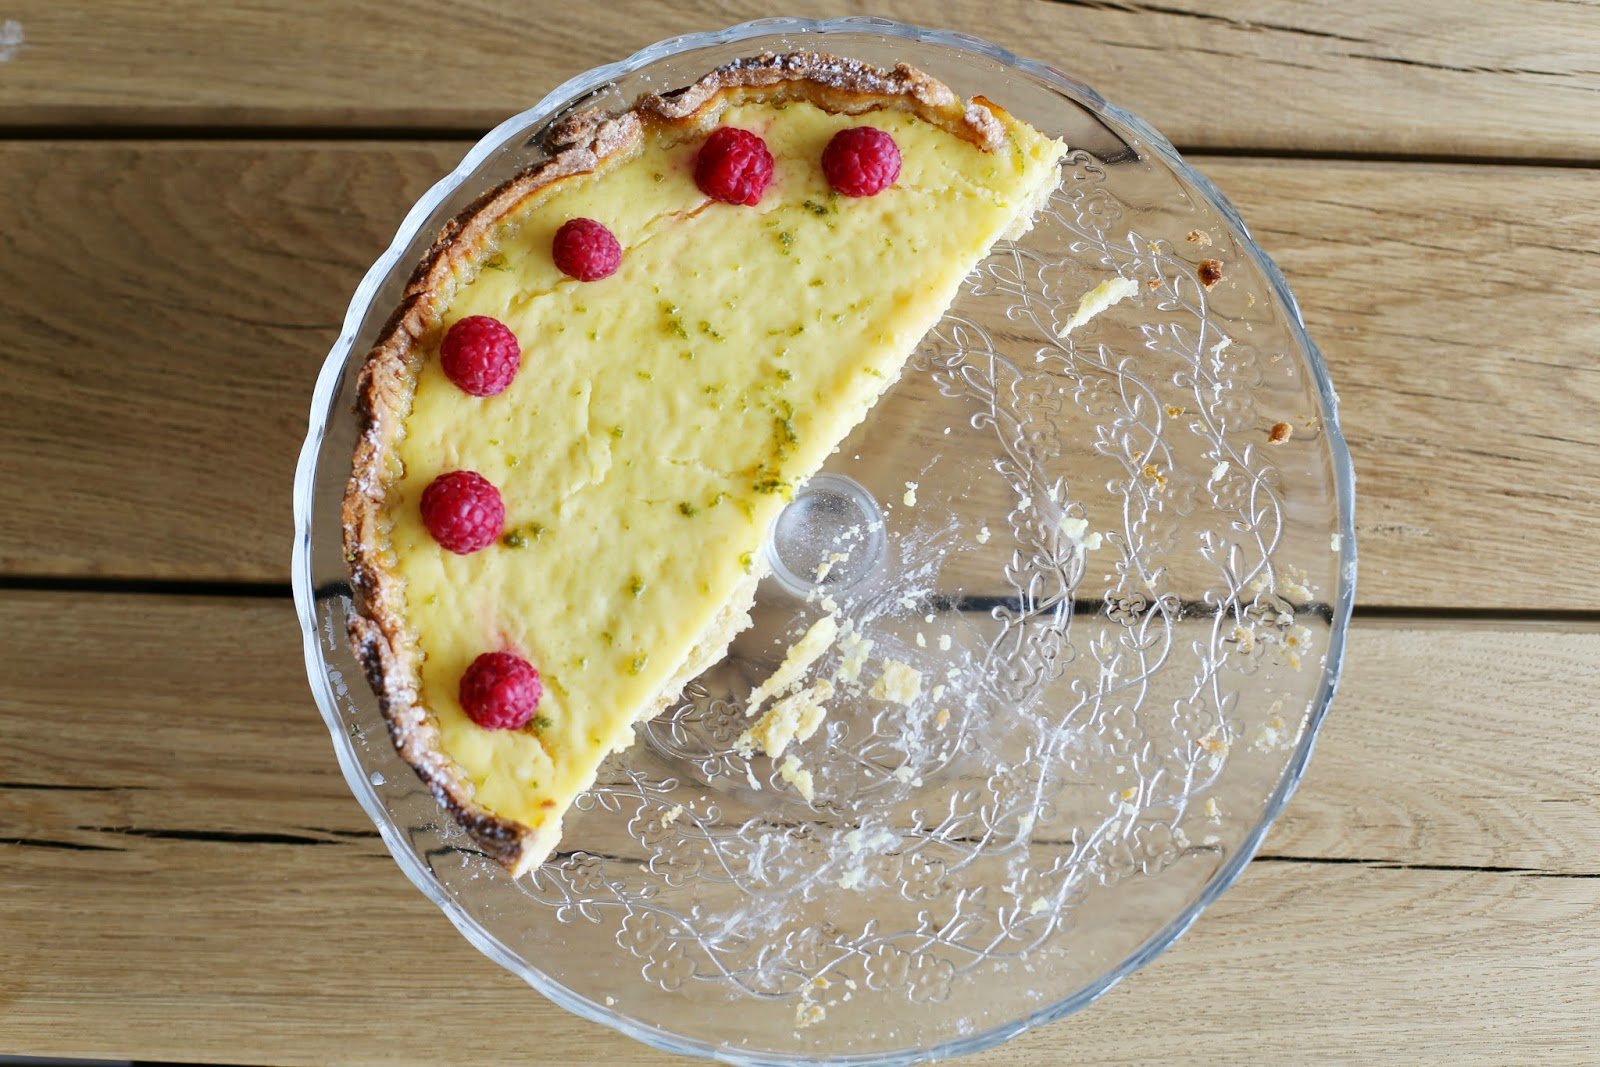 sunday 39 s recipe tarte au citron styleseeking zurich. Black Bedroom Furniture Sets. Home Design Ideas